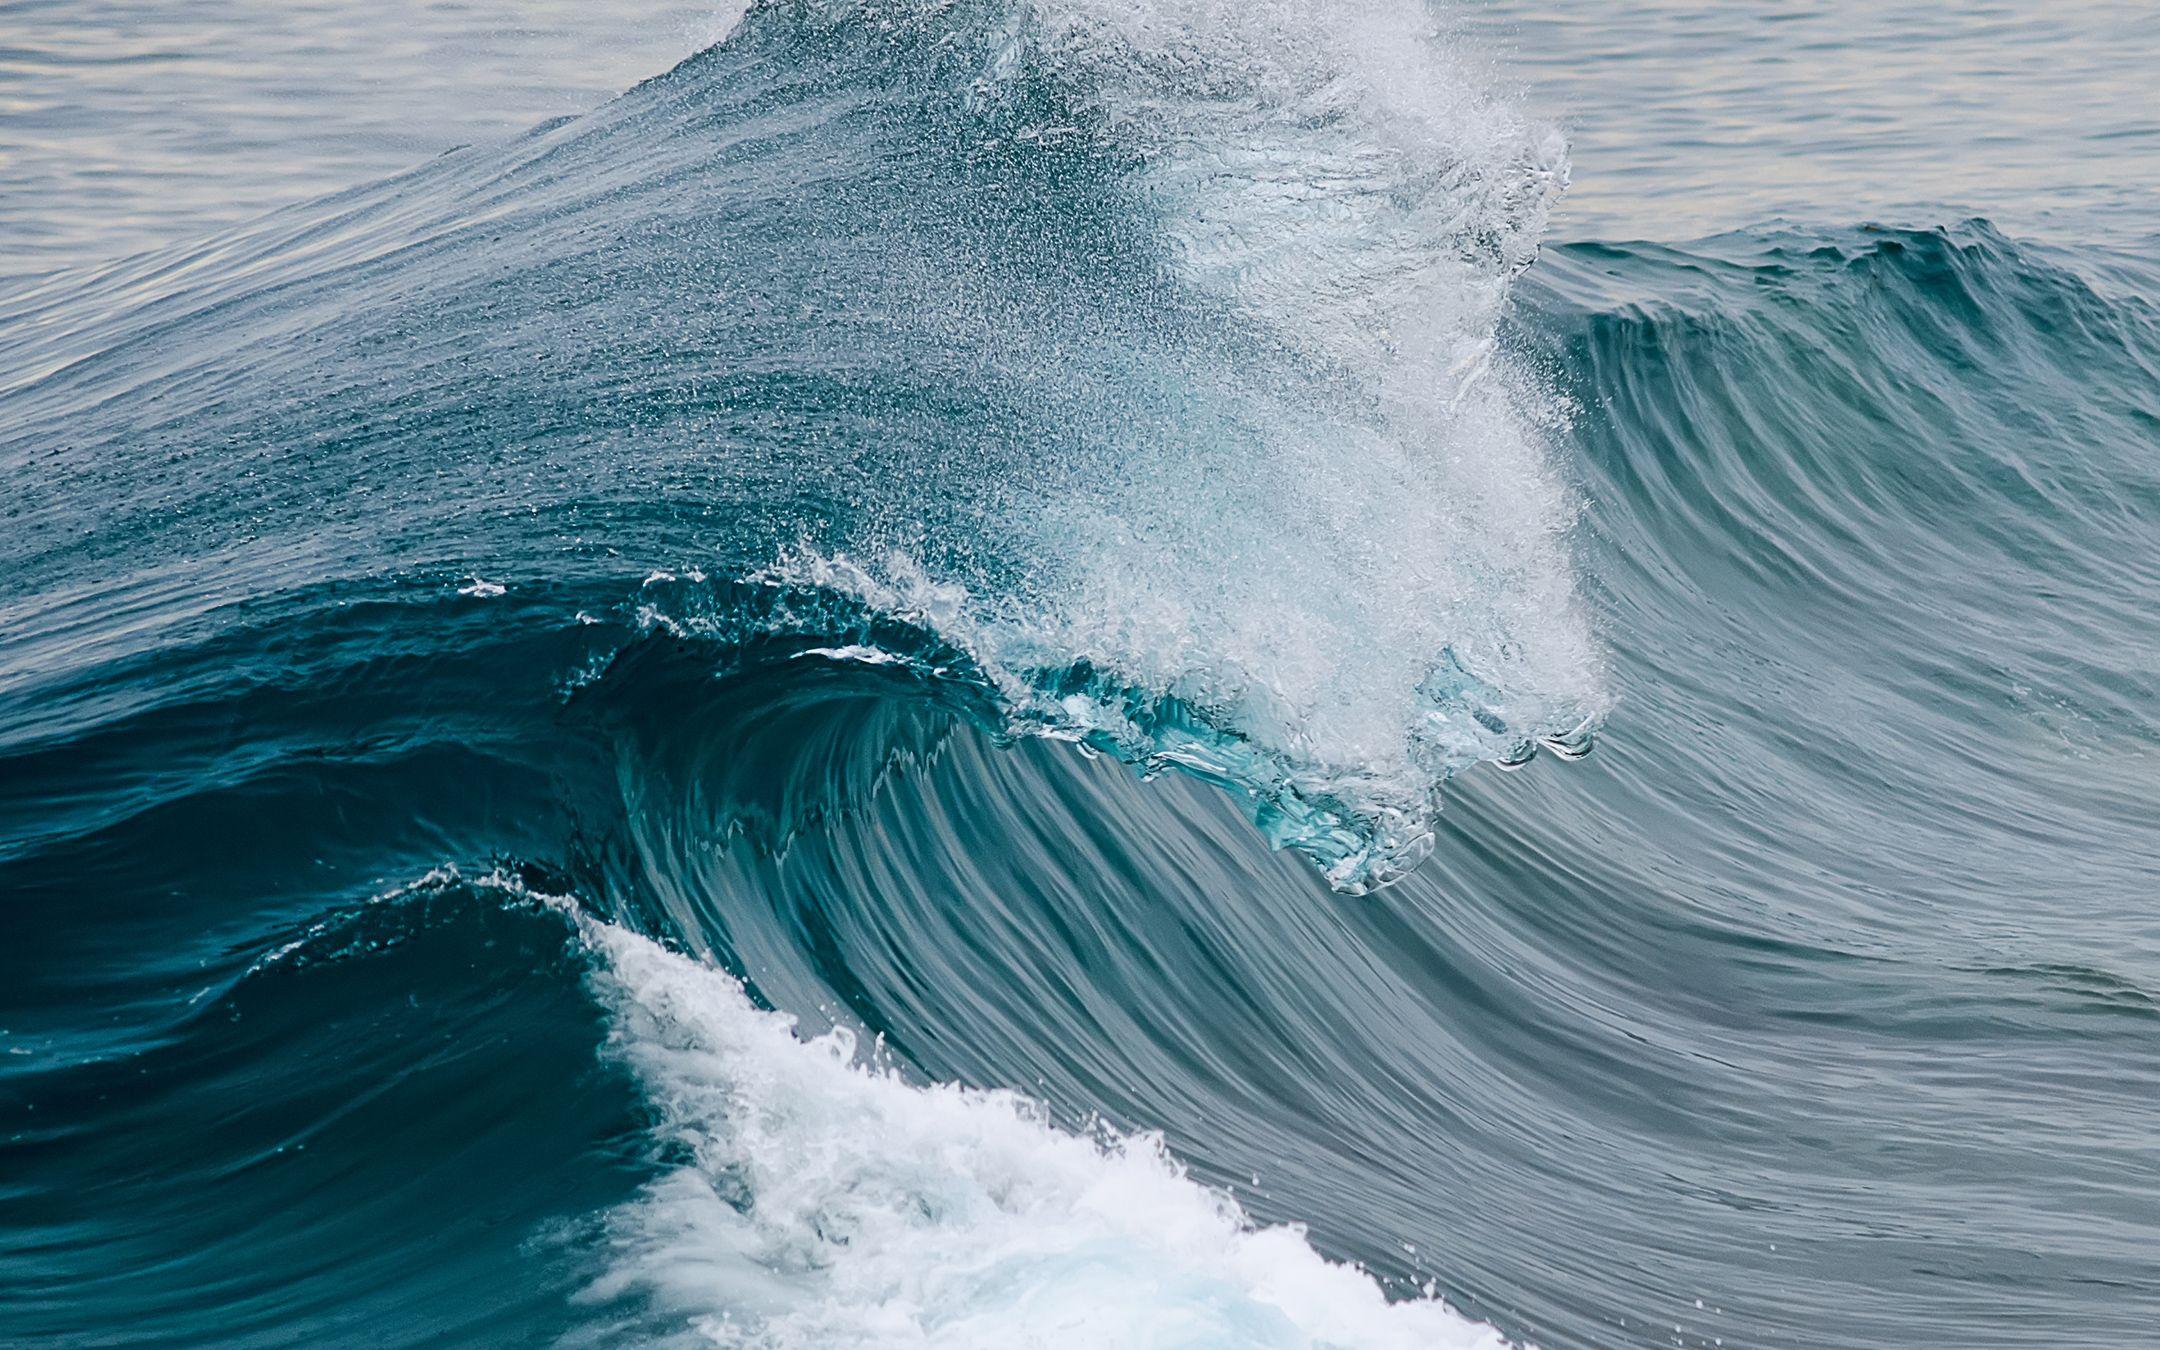 Ocean Waves Wallpapers - Wallpaper Cave